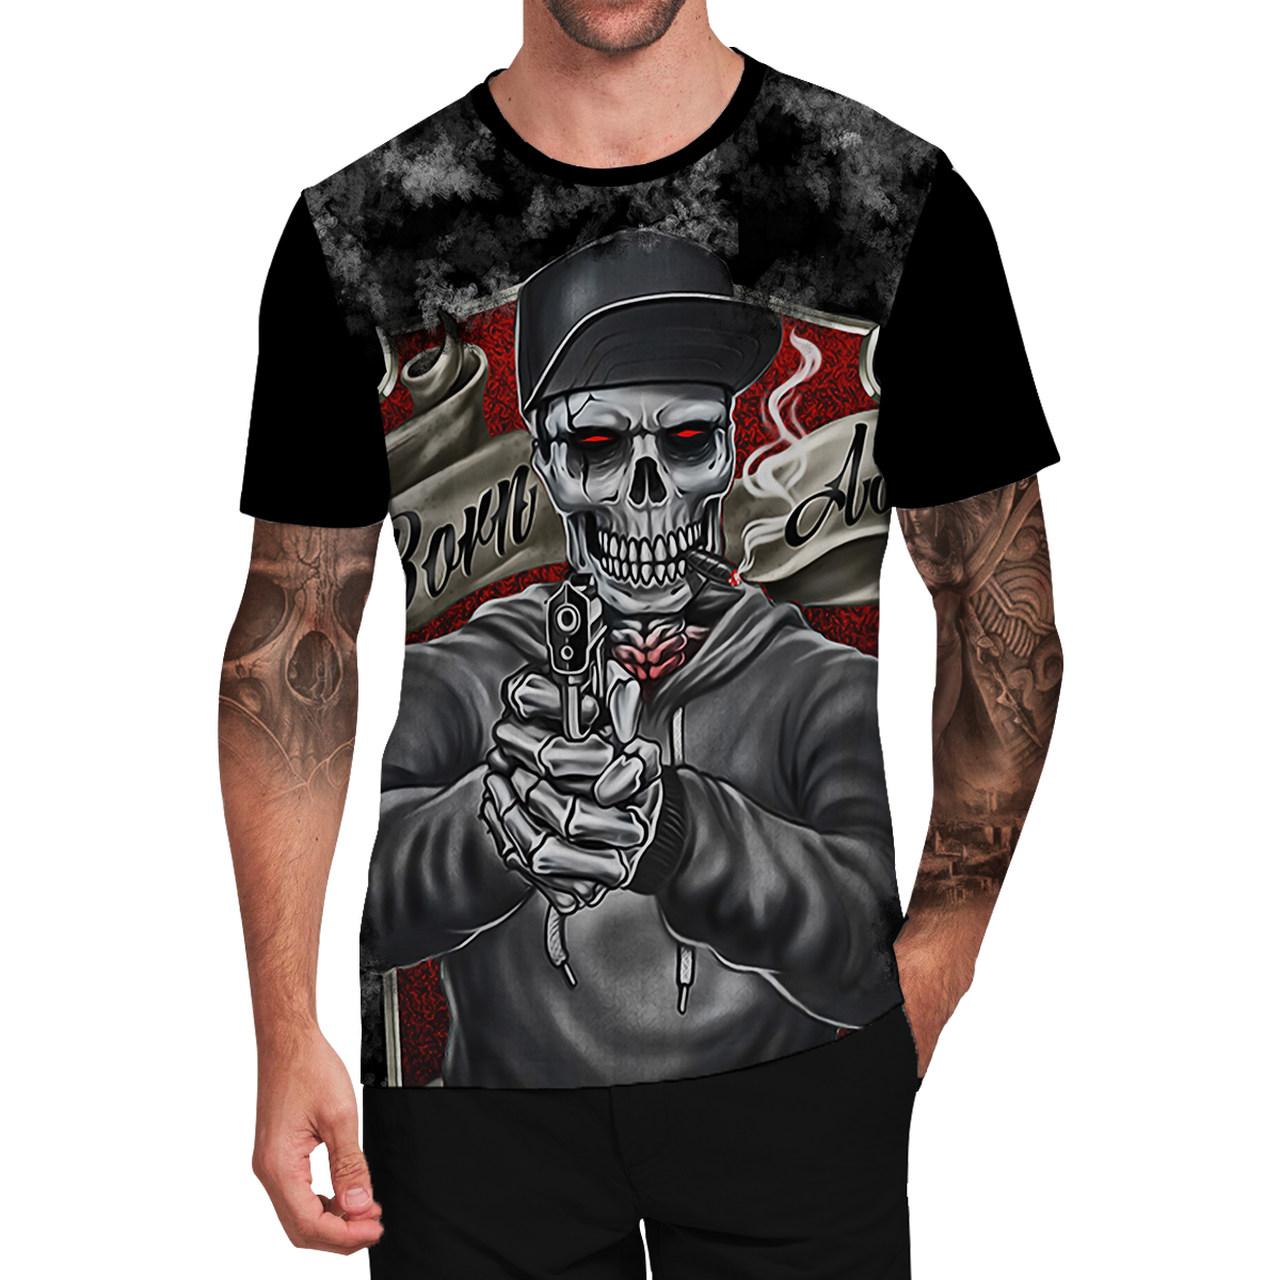 Stompy Camiseta Tattoo Tatuagem Caveira Skull 122